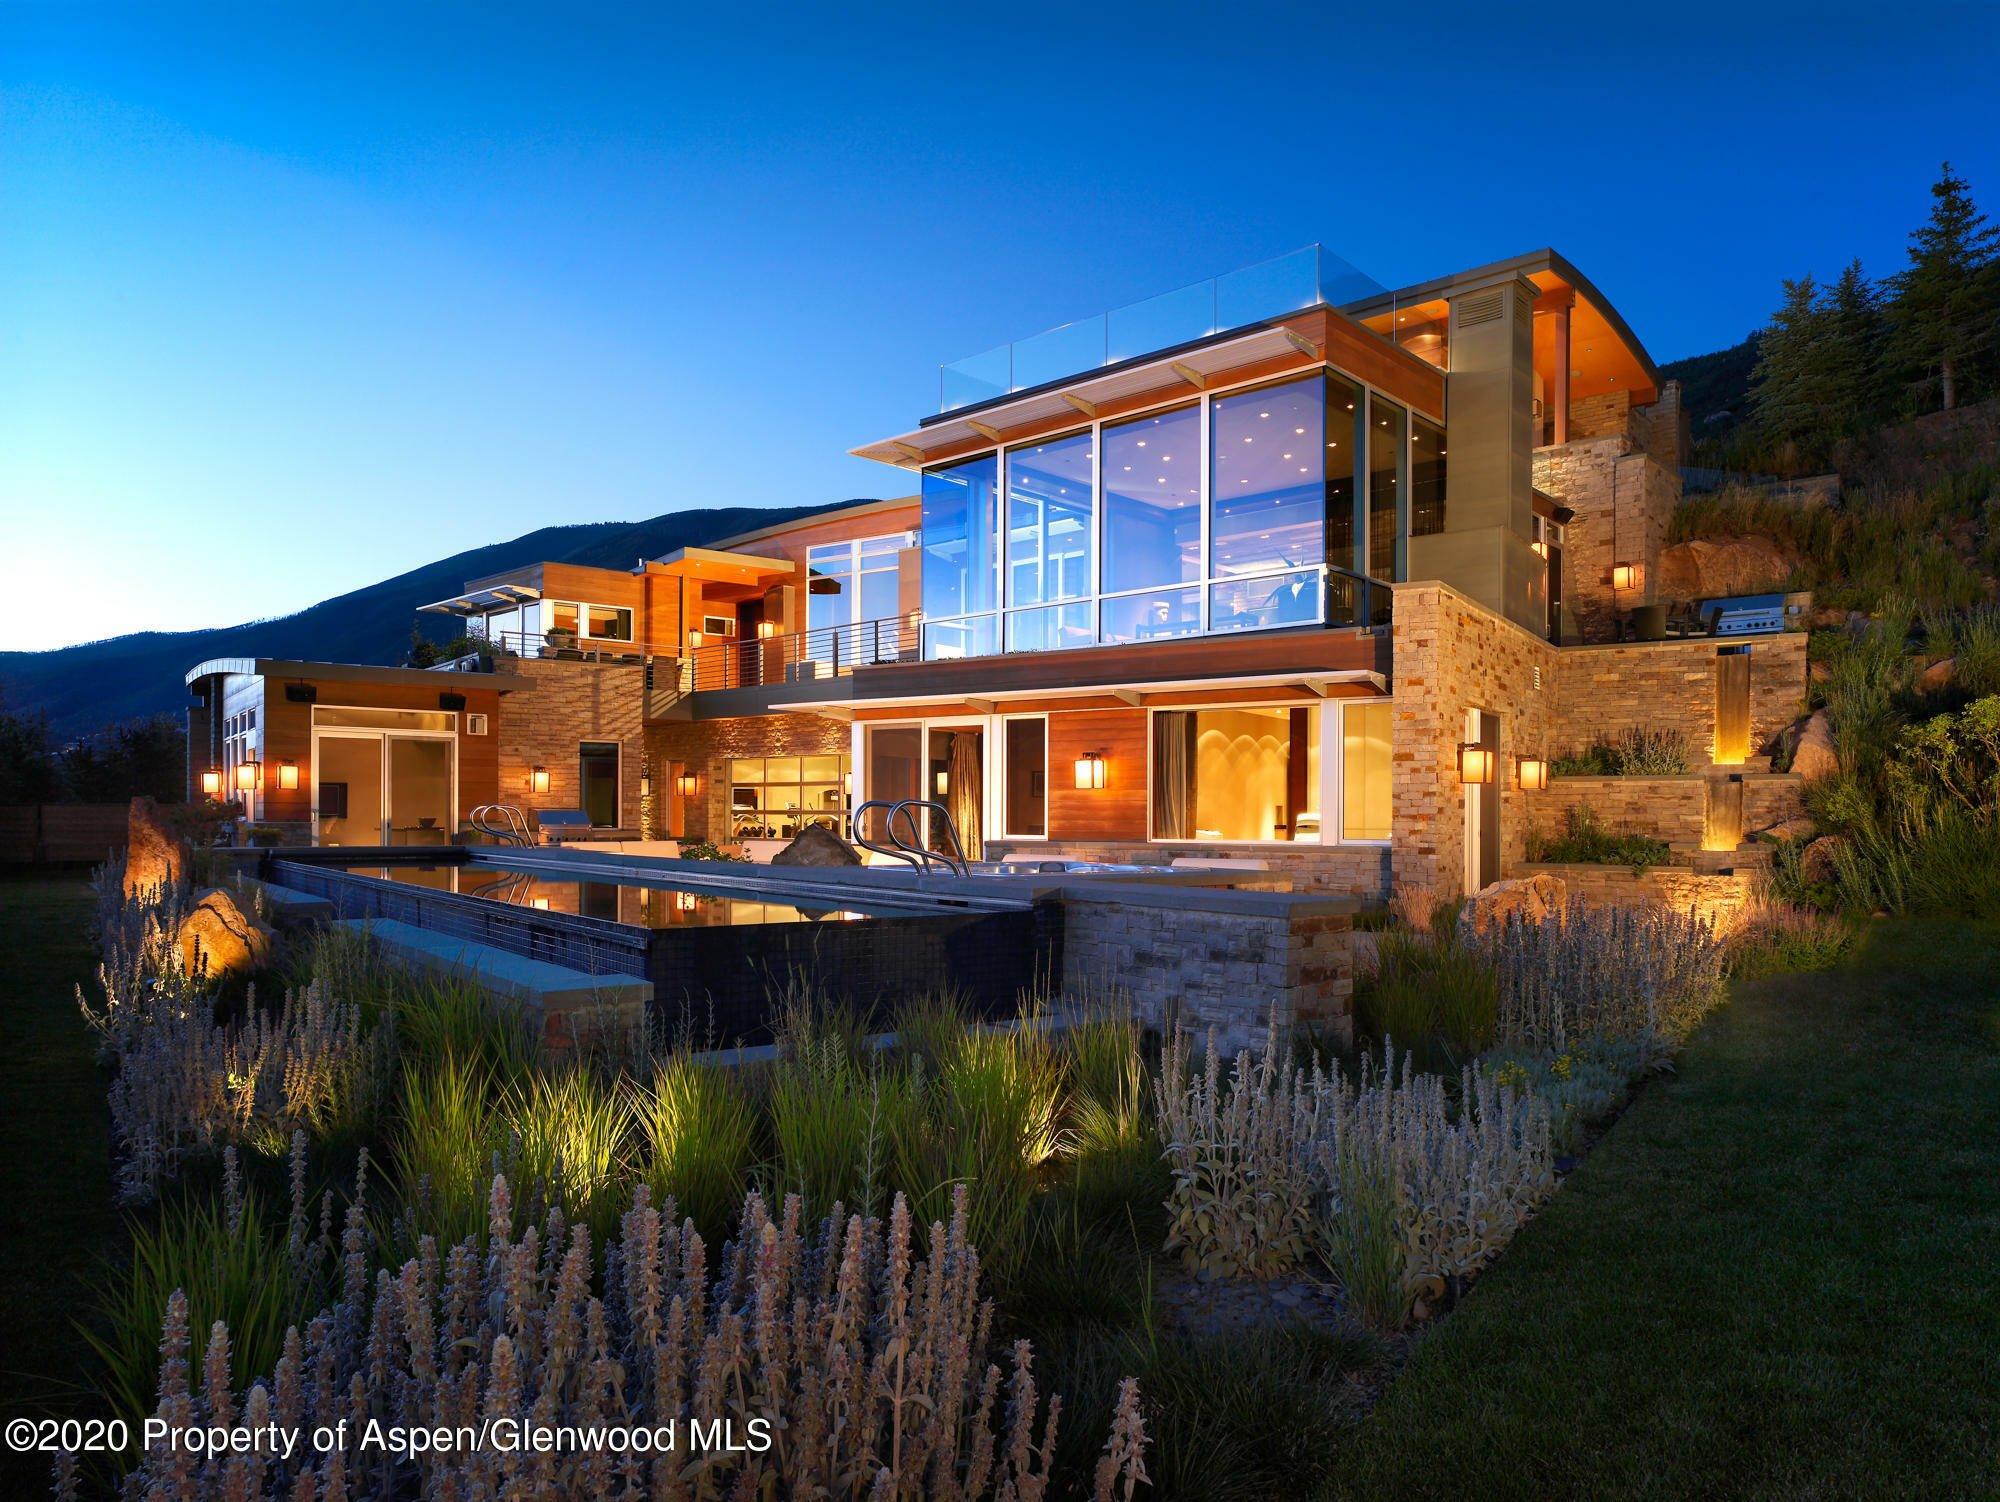 House in Aspen, Colorado, United States 1